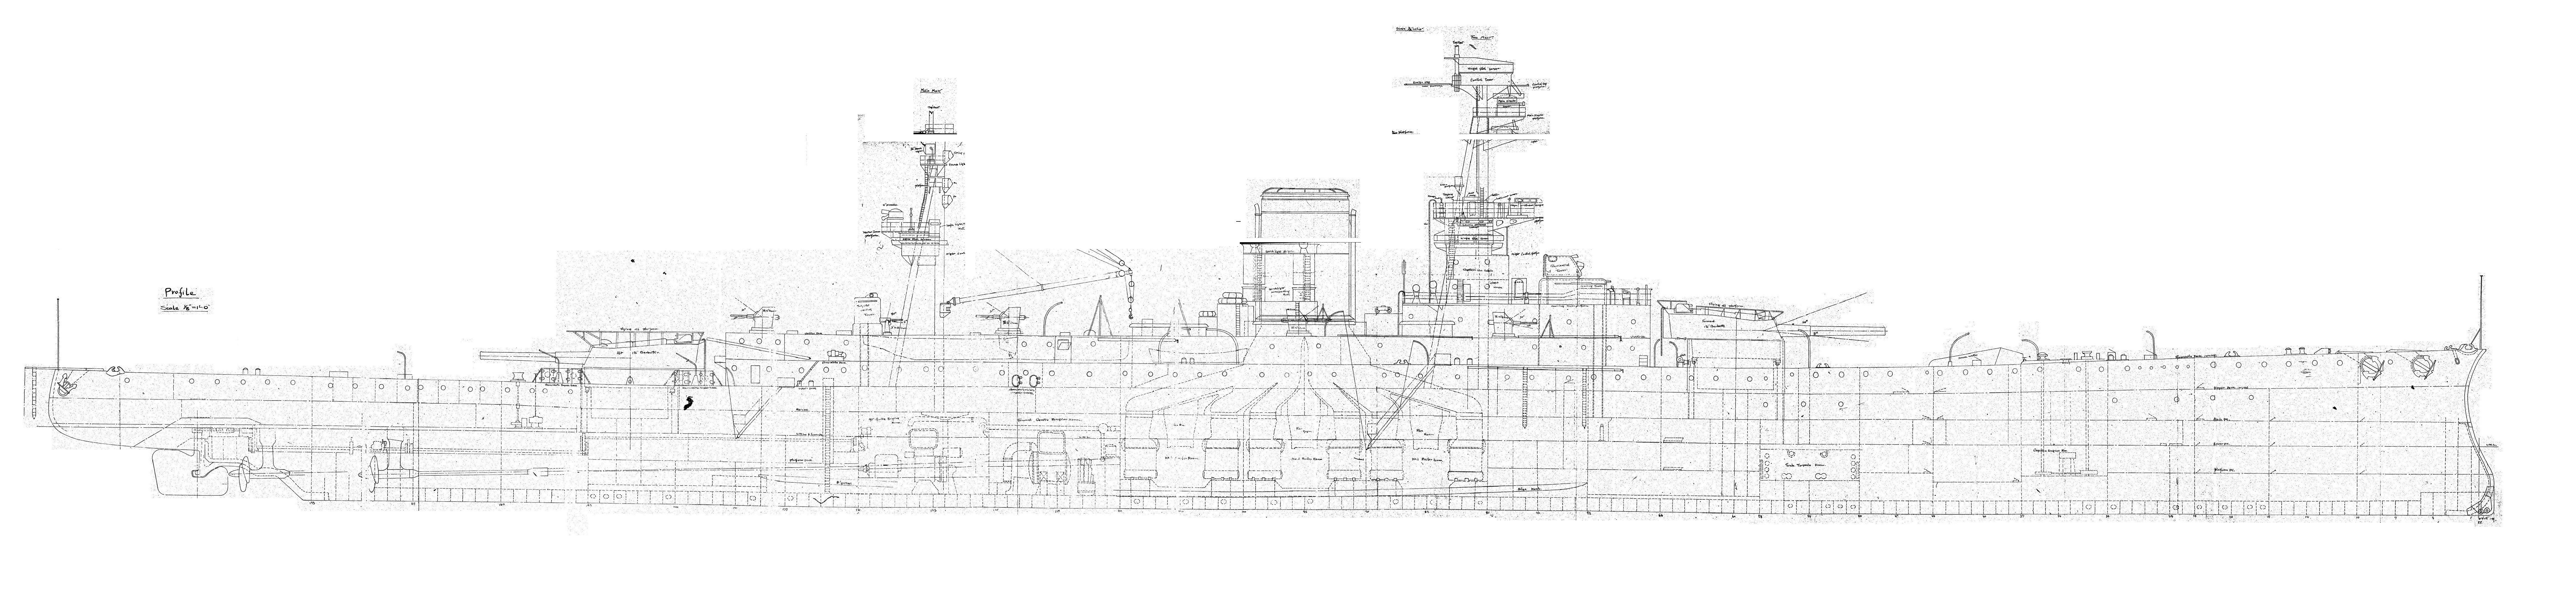 схема чертёж крейсера сума